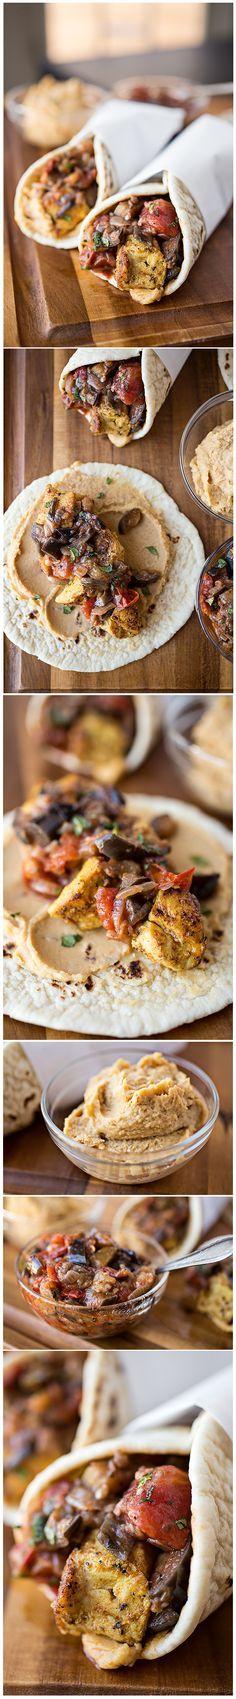 Spiced Moroccan Chicken Wrap